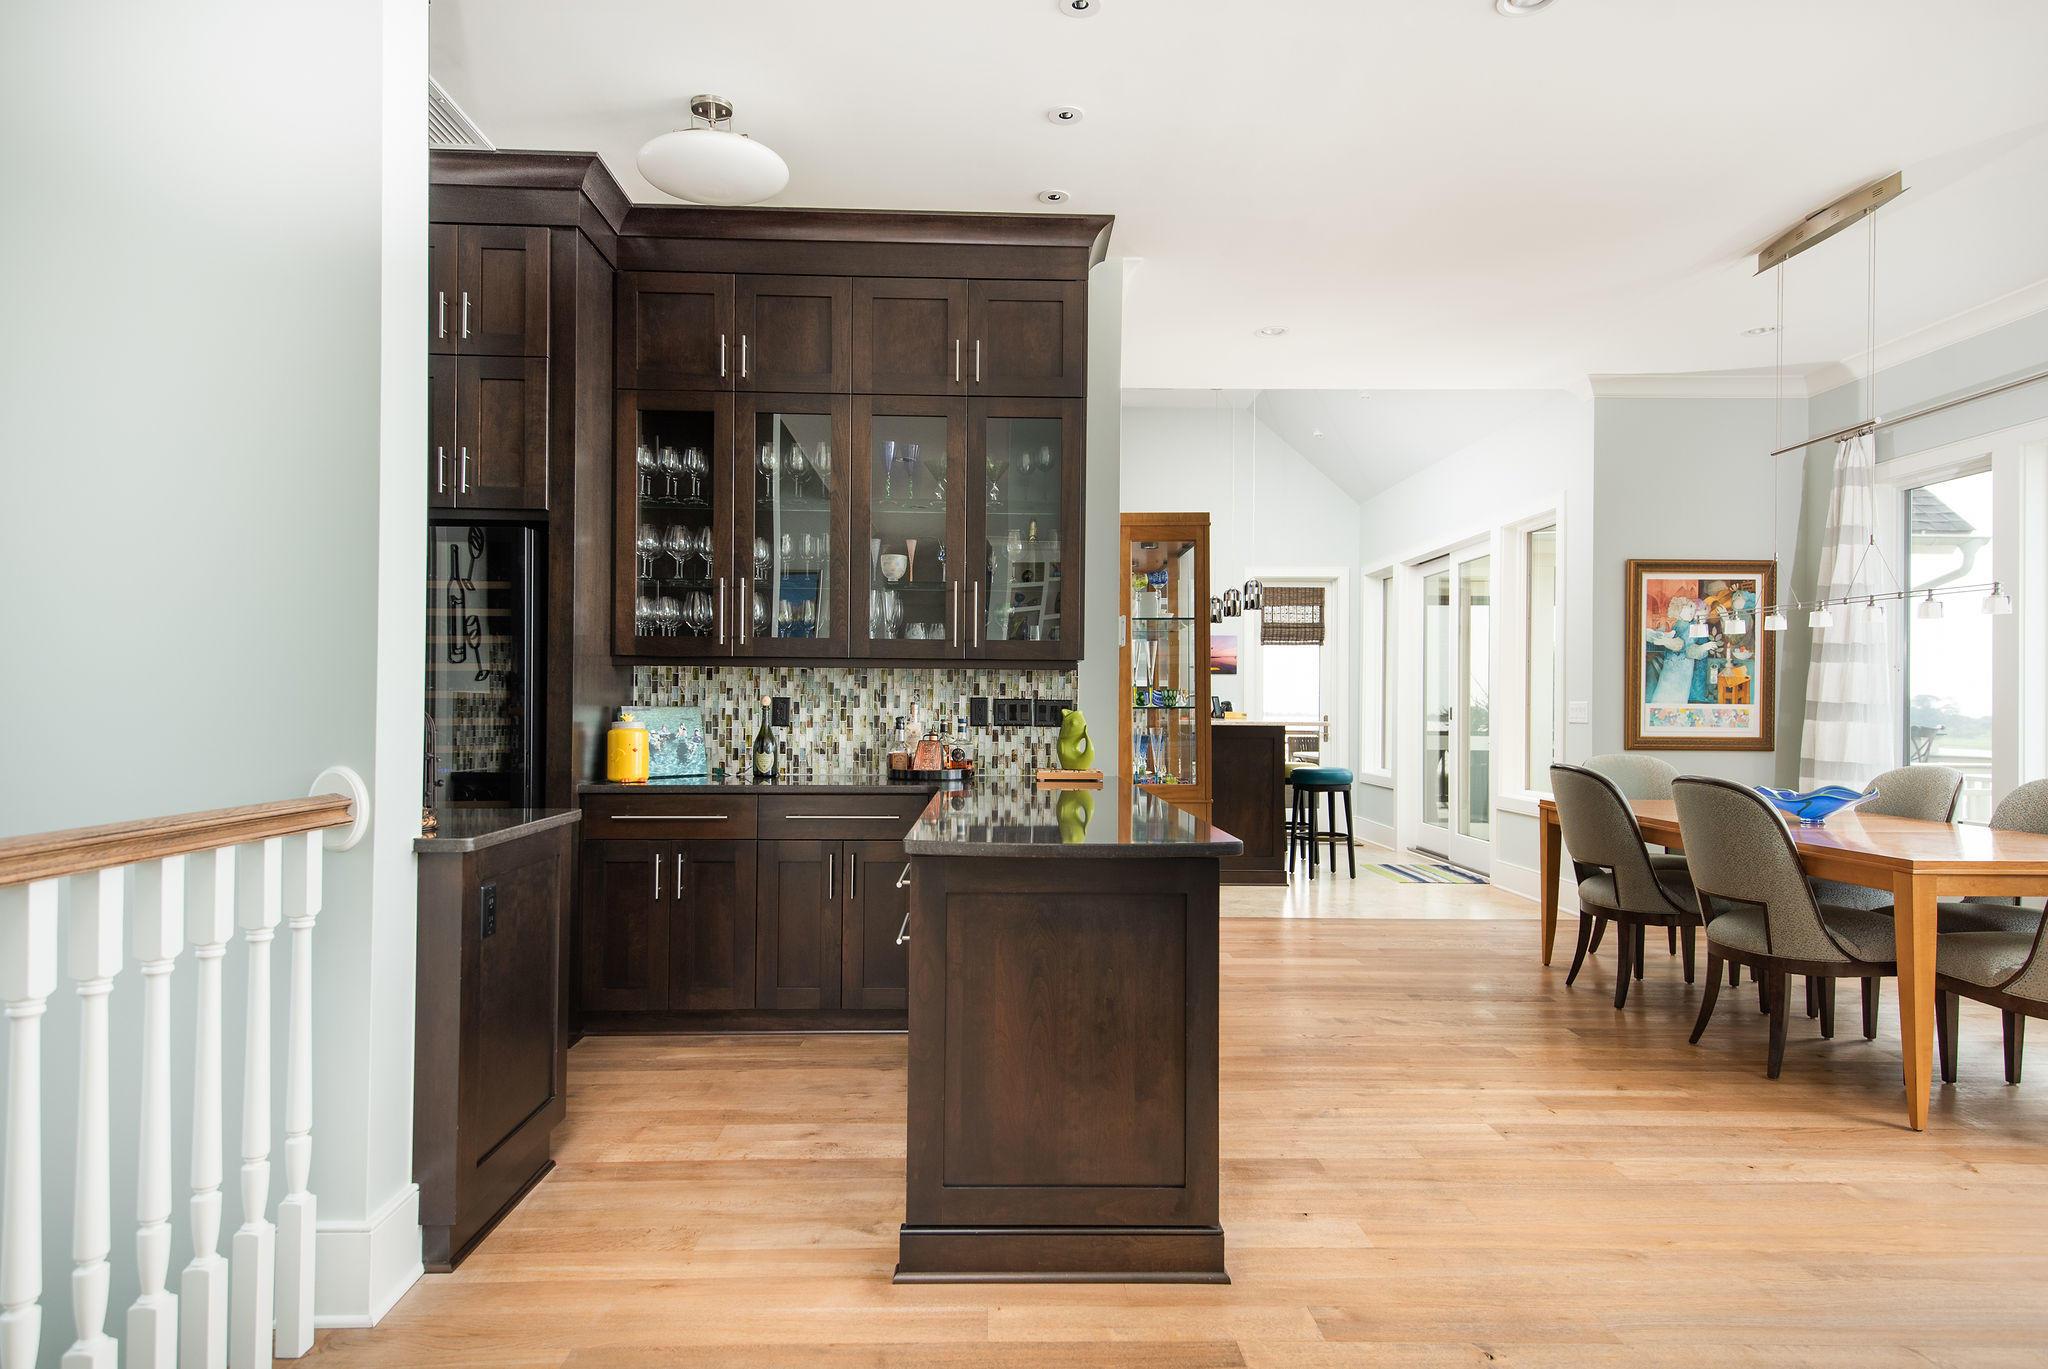 Seabrook Island Homes For Sale - 3135 Marshgate, Seabrook Island, SC - 53